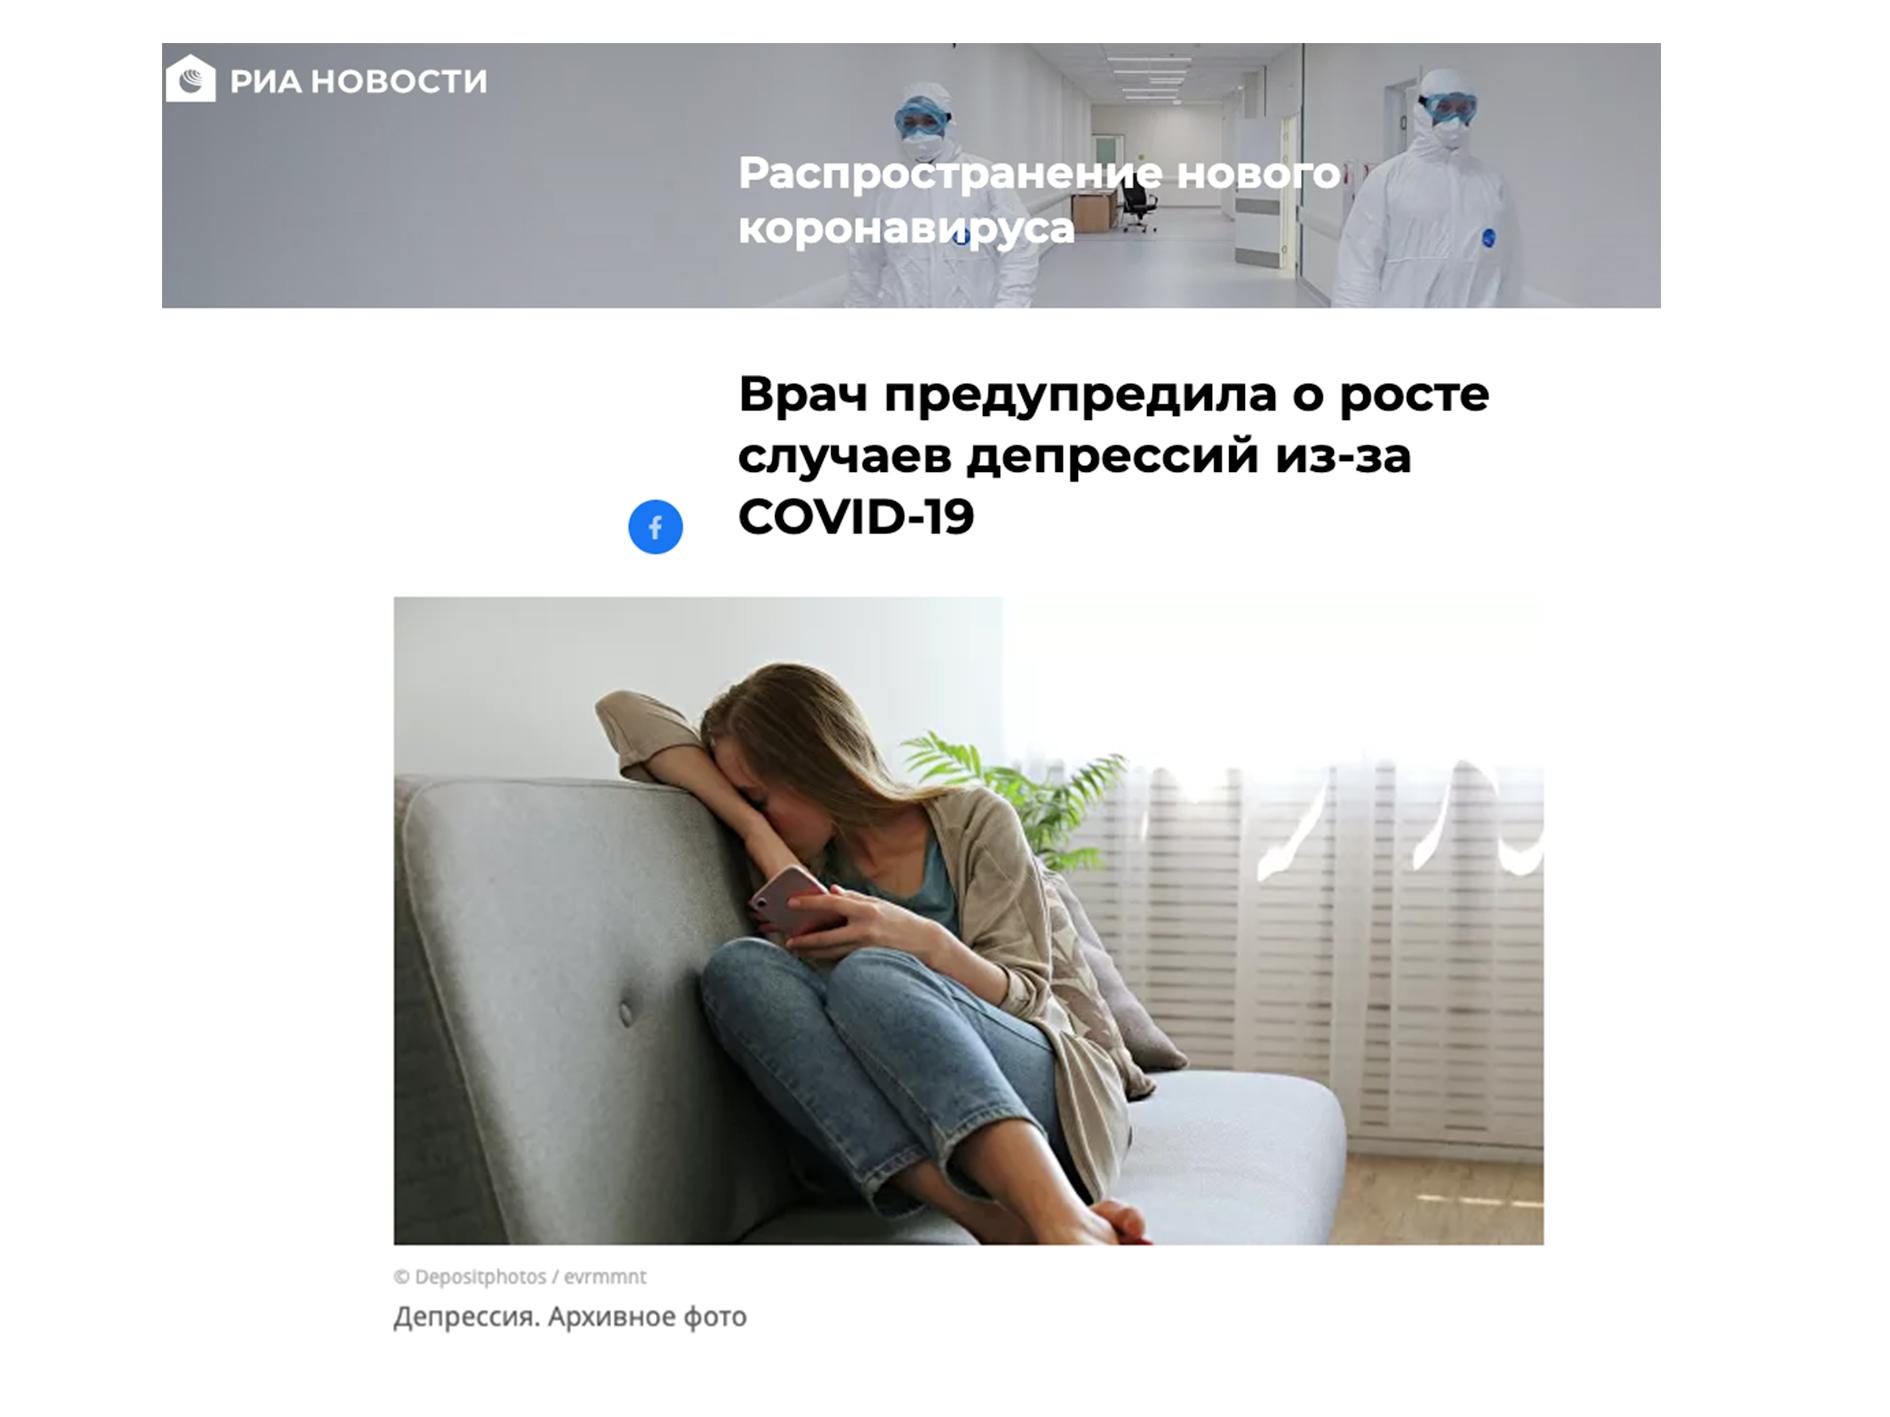 Intervista a Sara Reginella per Ria Novosti